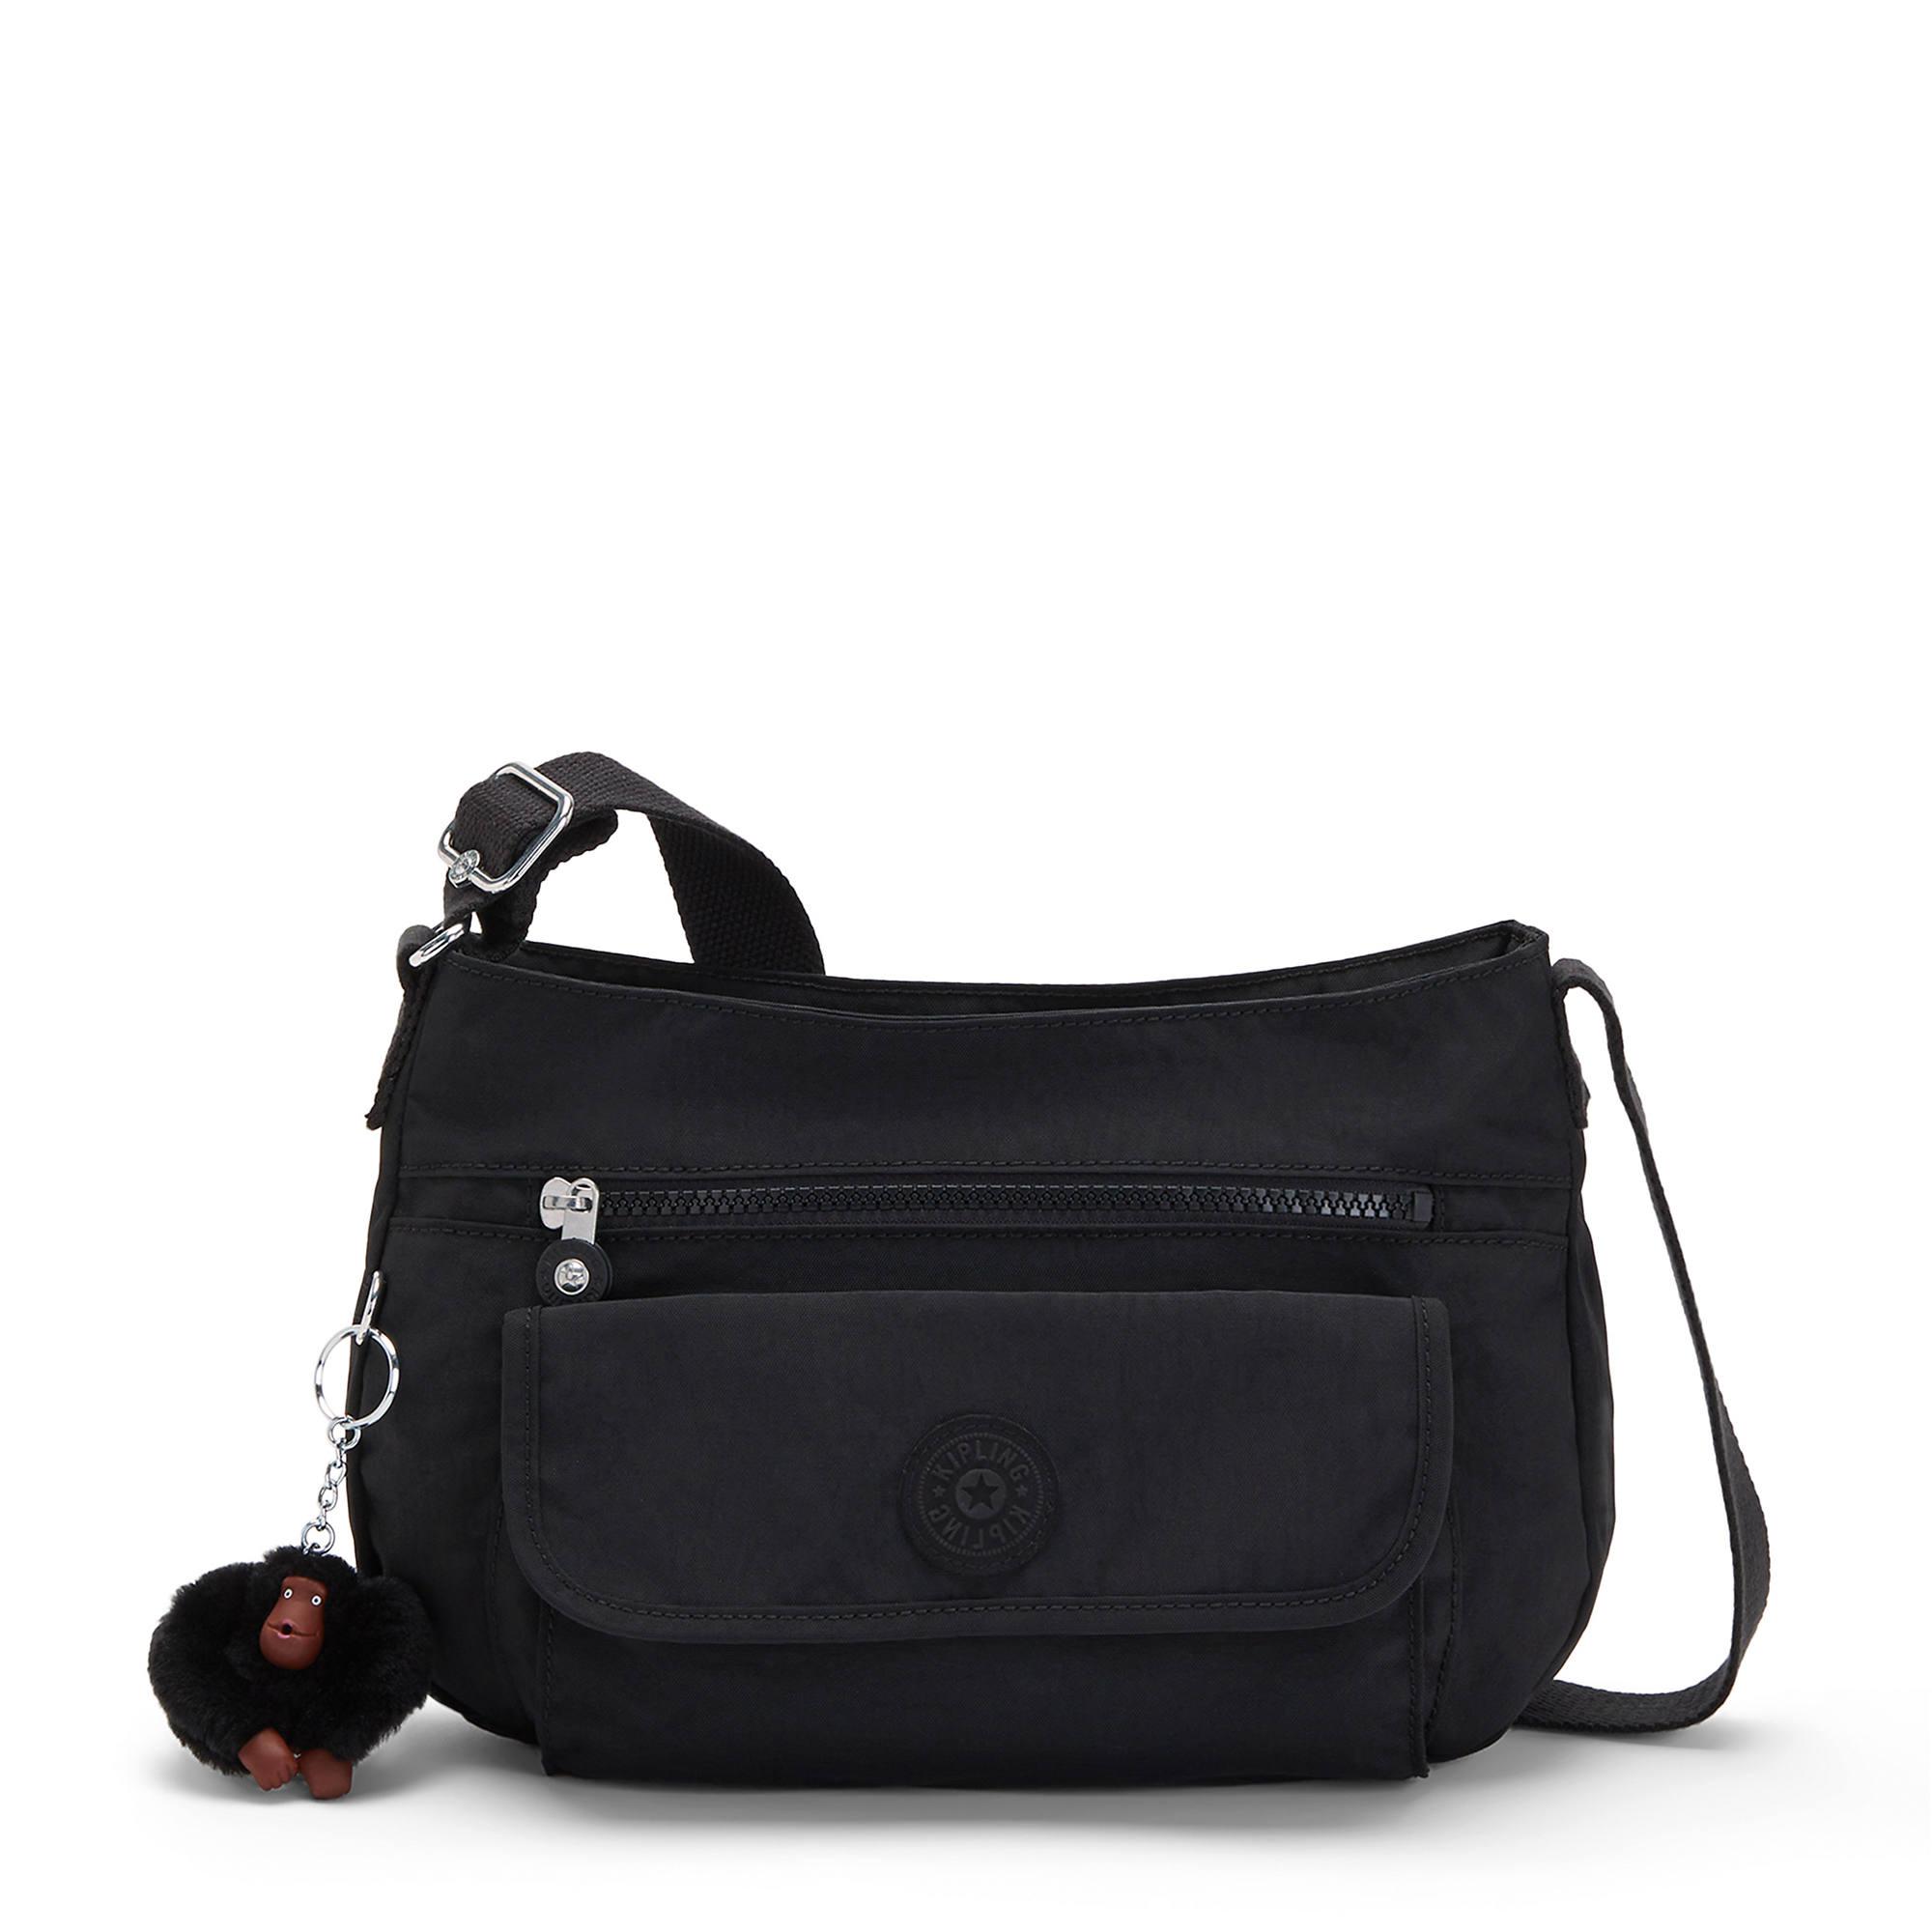 syro crossbody bag